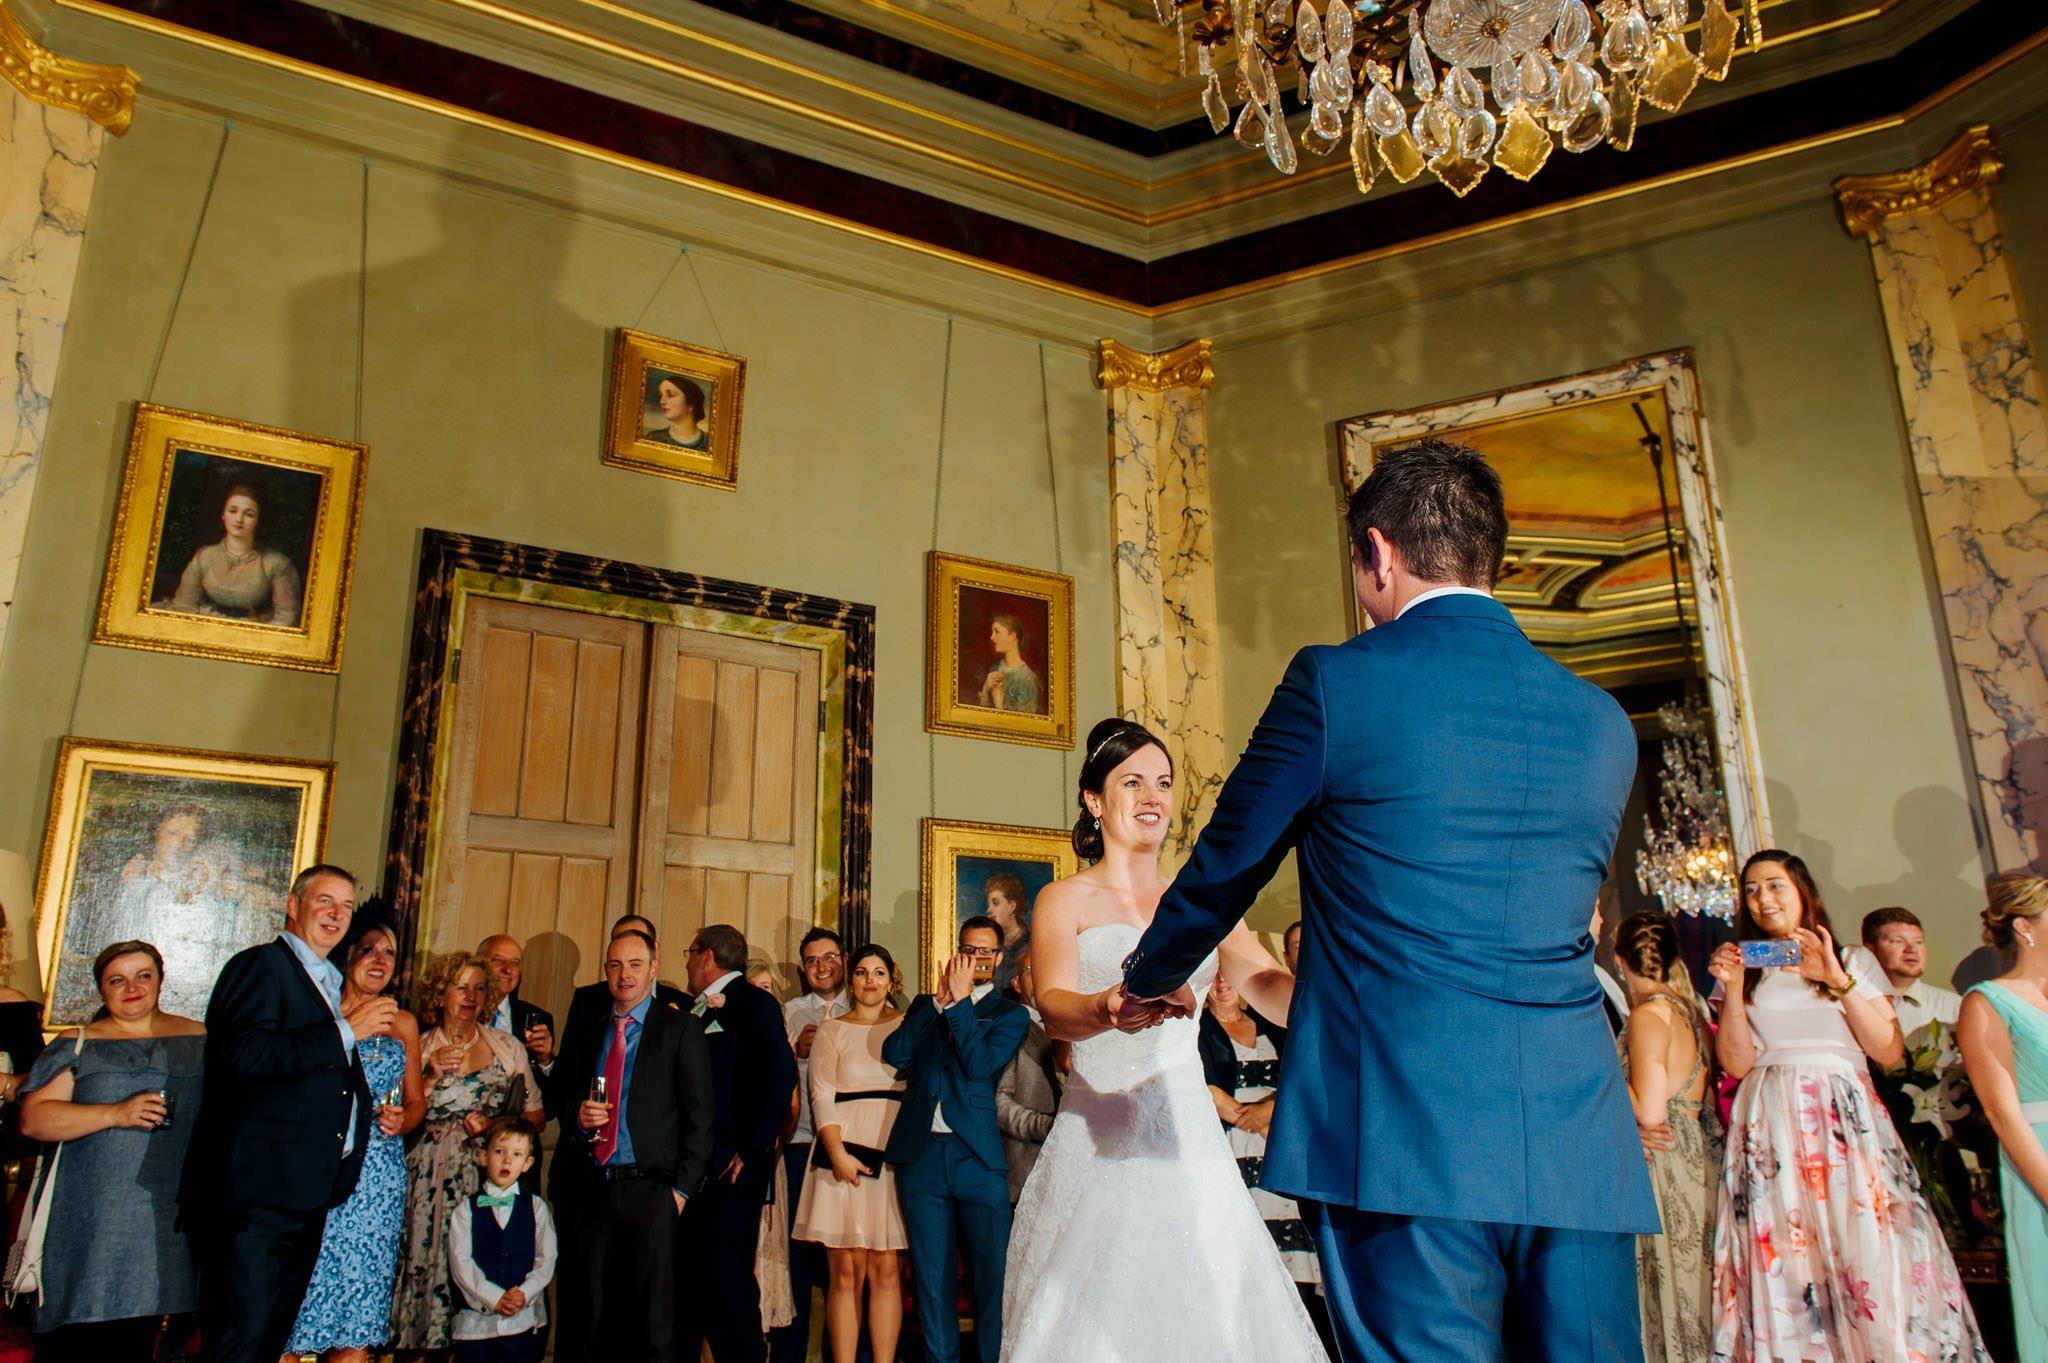 Eastnor Castle wedding photographer Herefordshire, West Midlands - Sarah + Dean 62